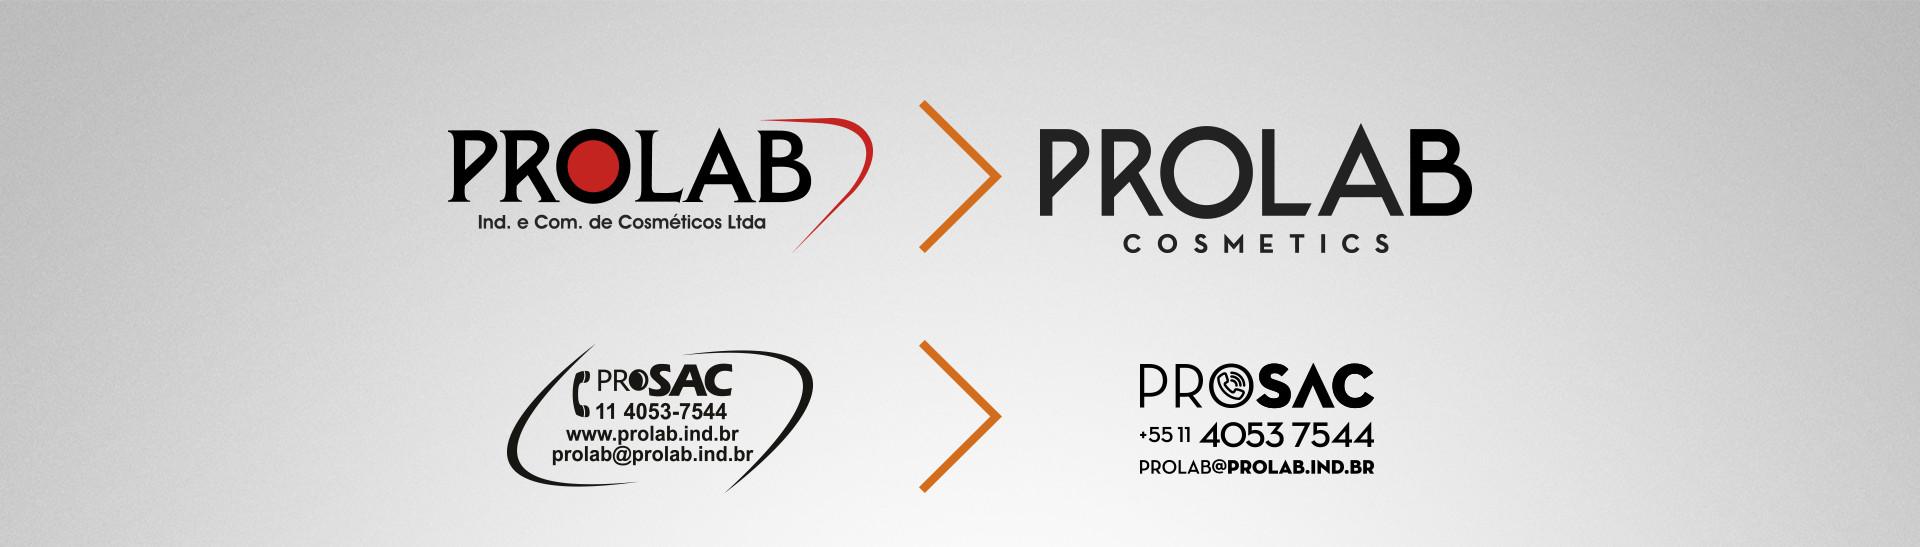 rebrand Prolab Cosmetics